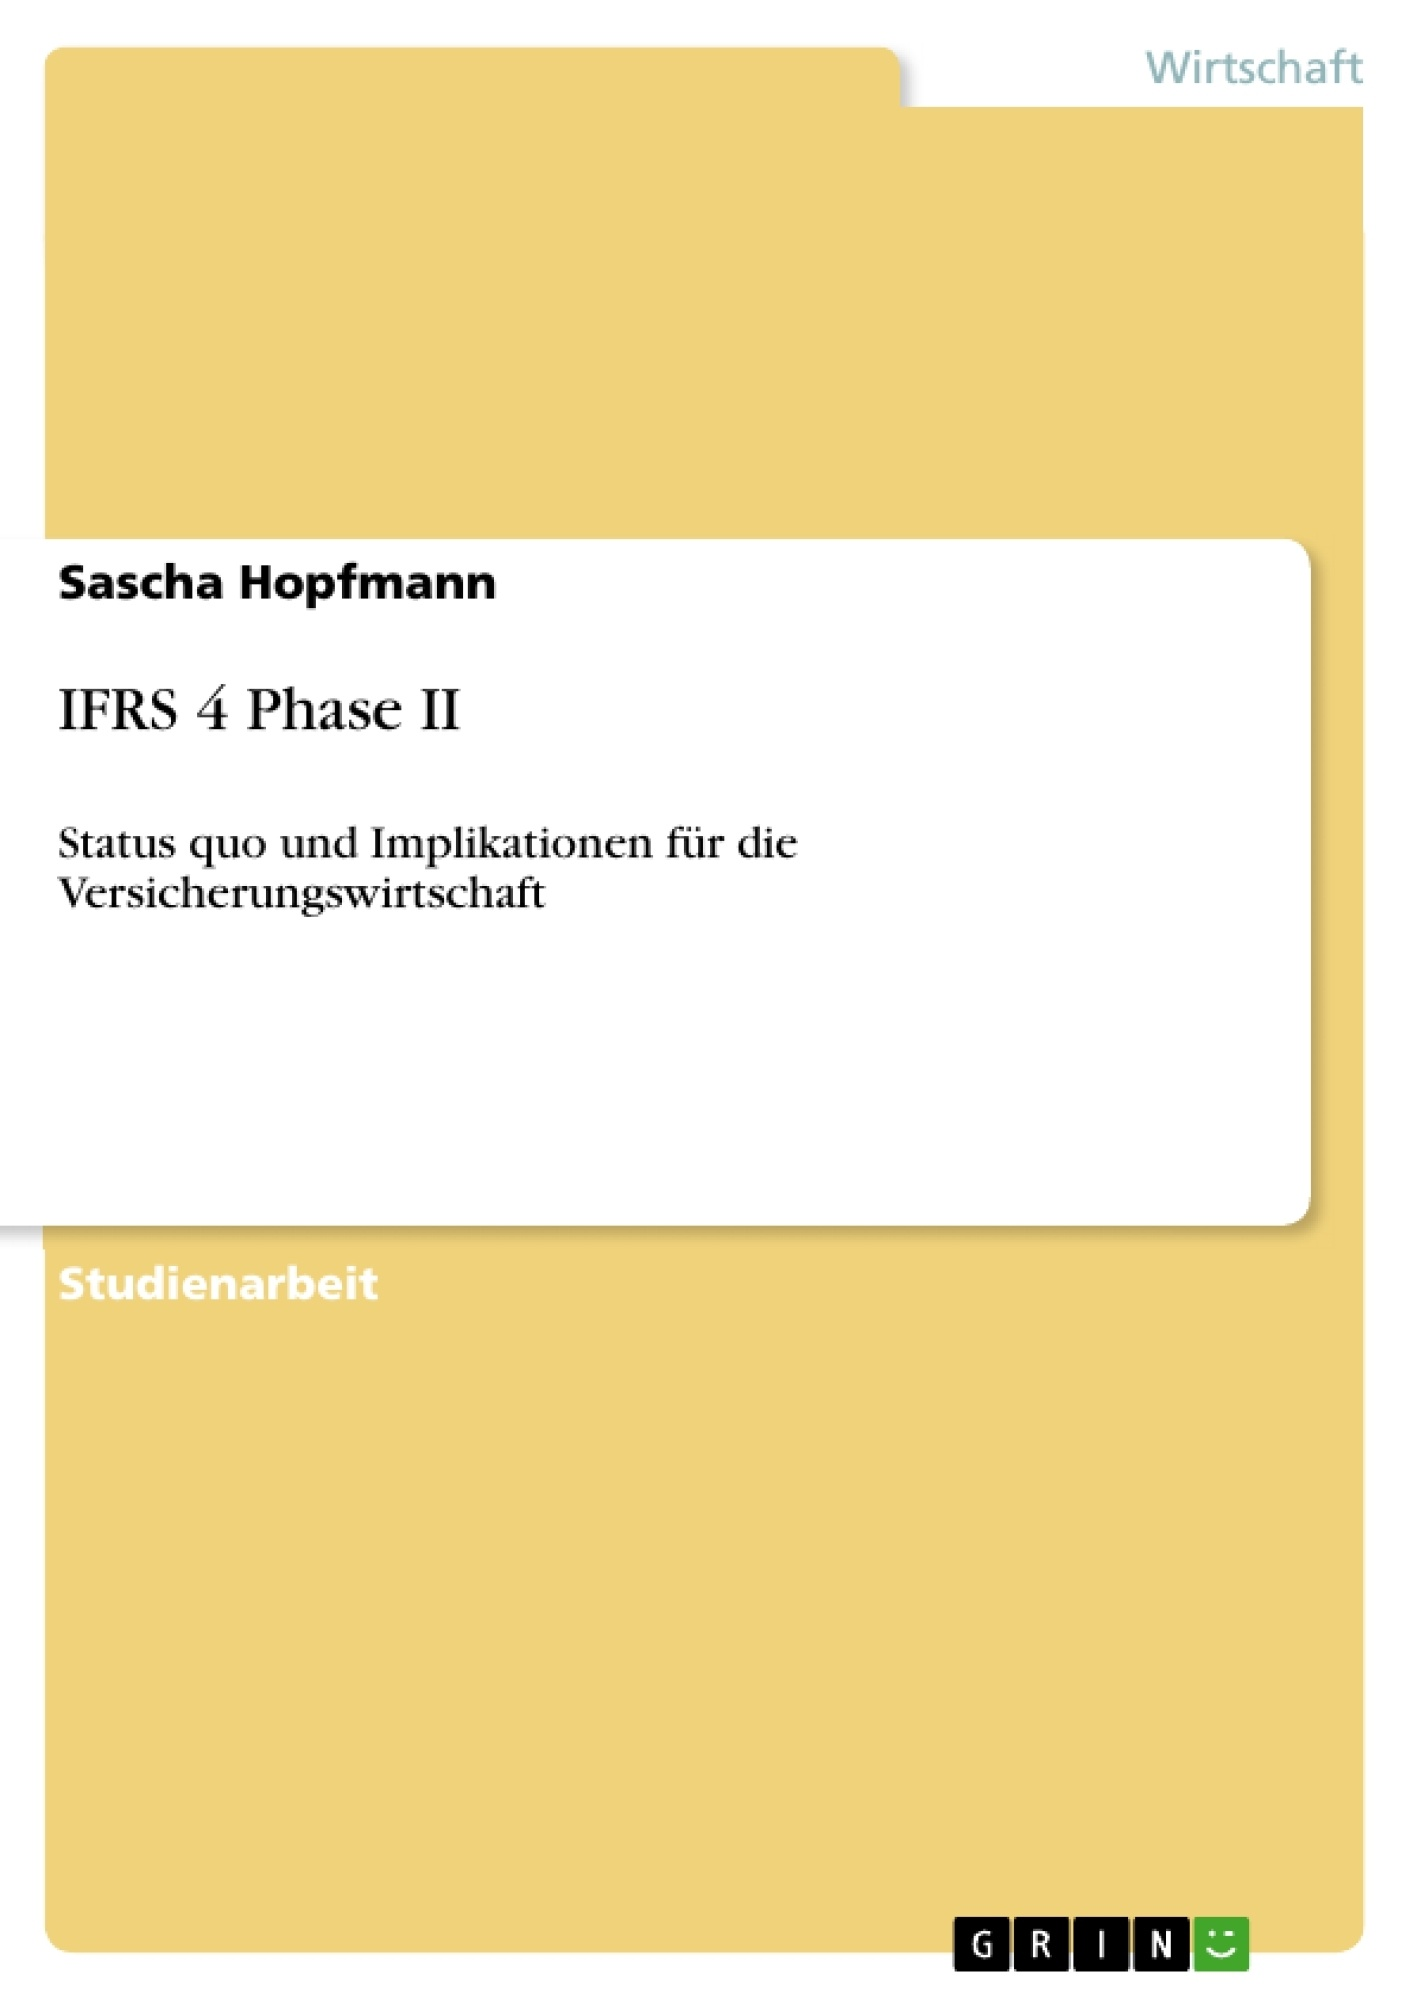 Titel: IFRS 4 Phase II